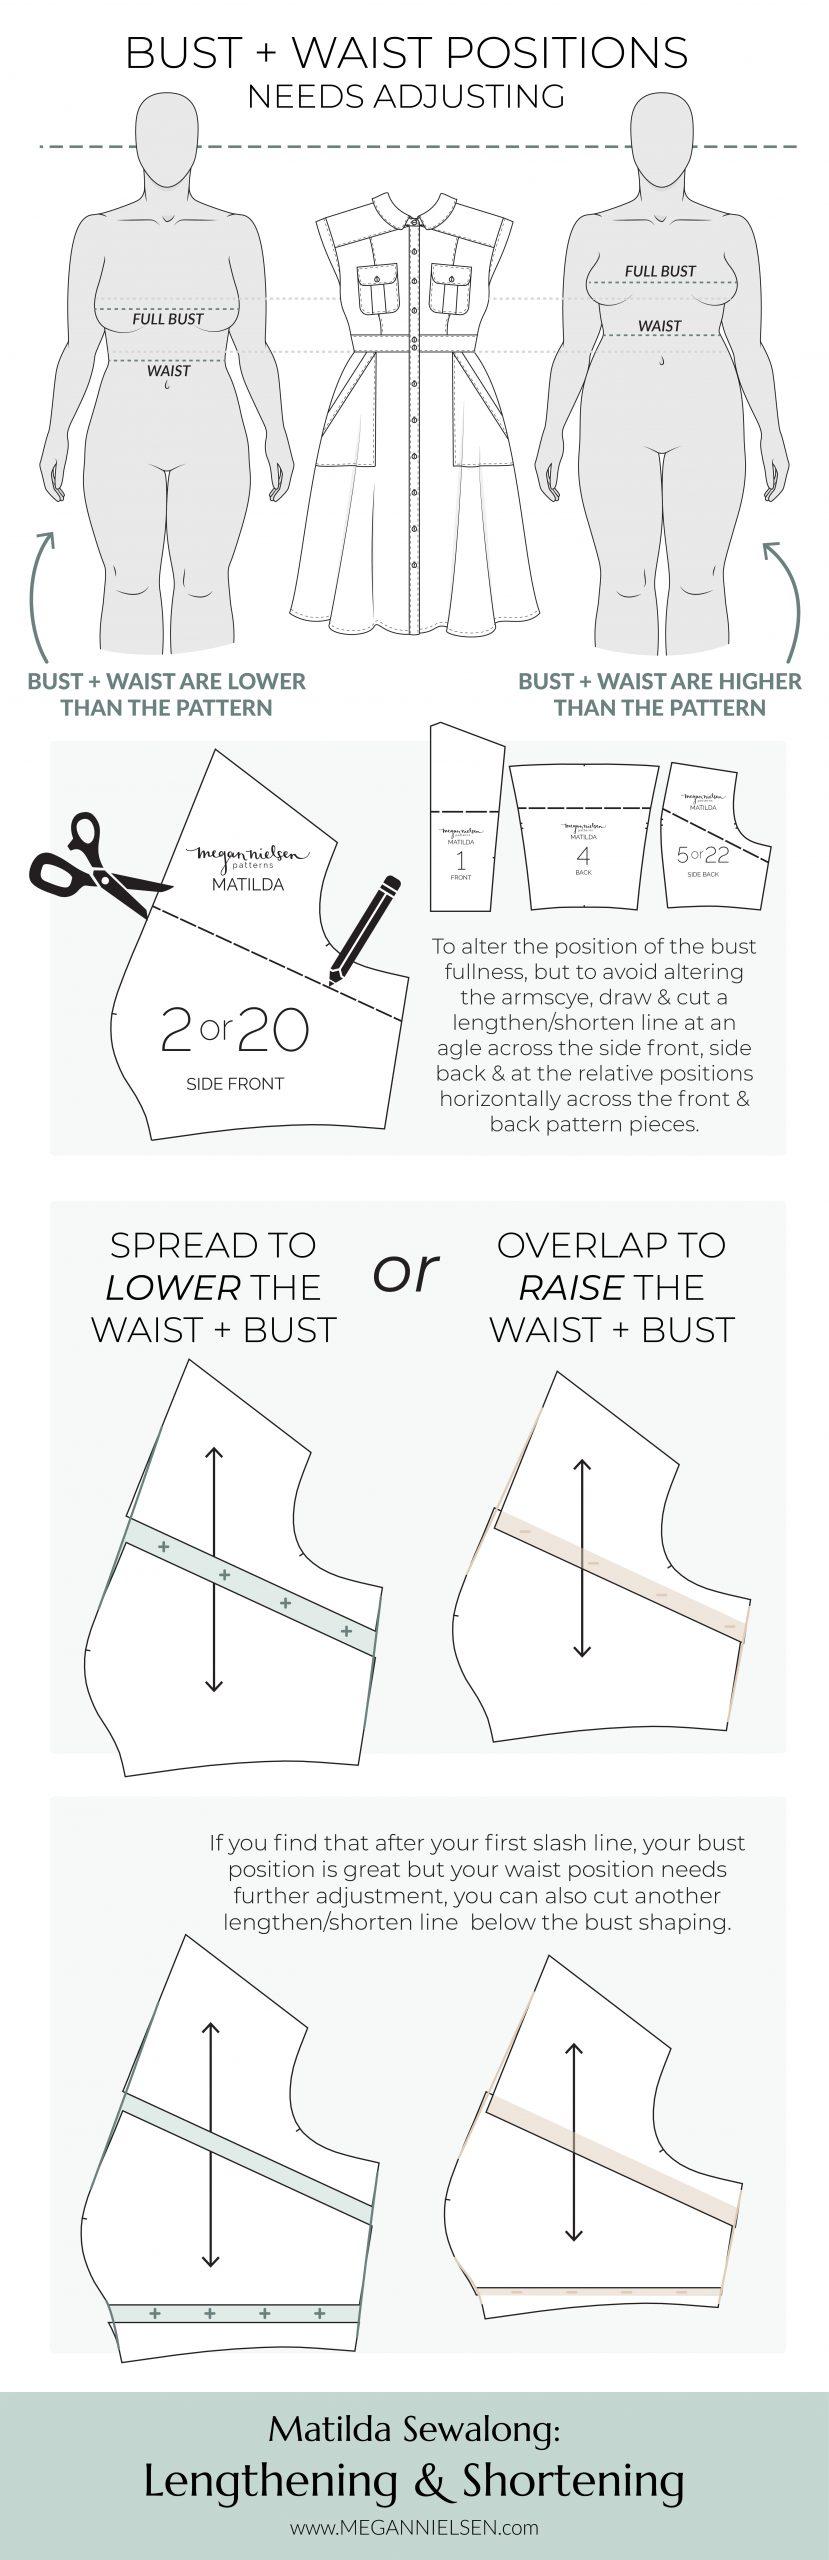 Megan Nielsen Patterns | Matilda Sewalong: Lengthening & Shortening - Adjusting The Bust & Waist Position